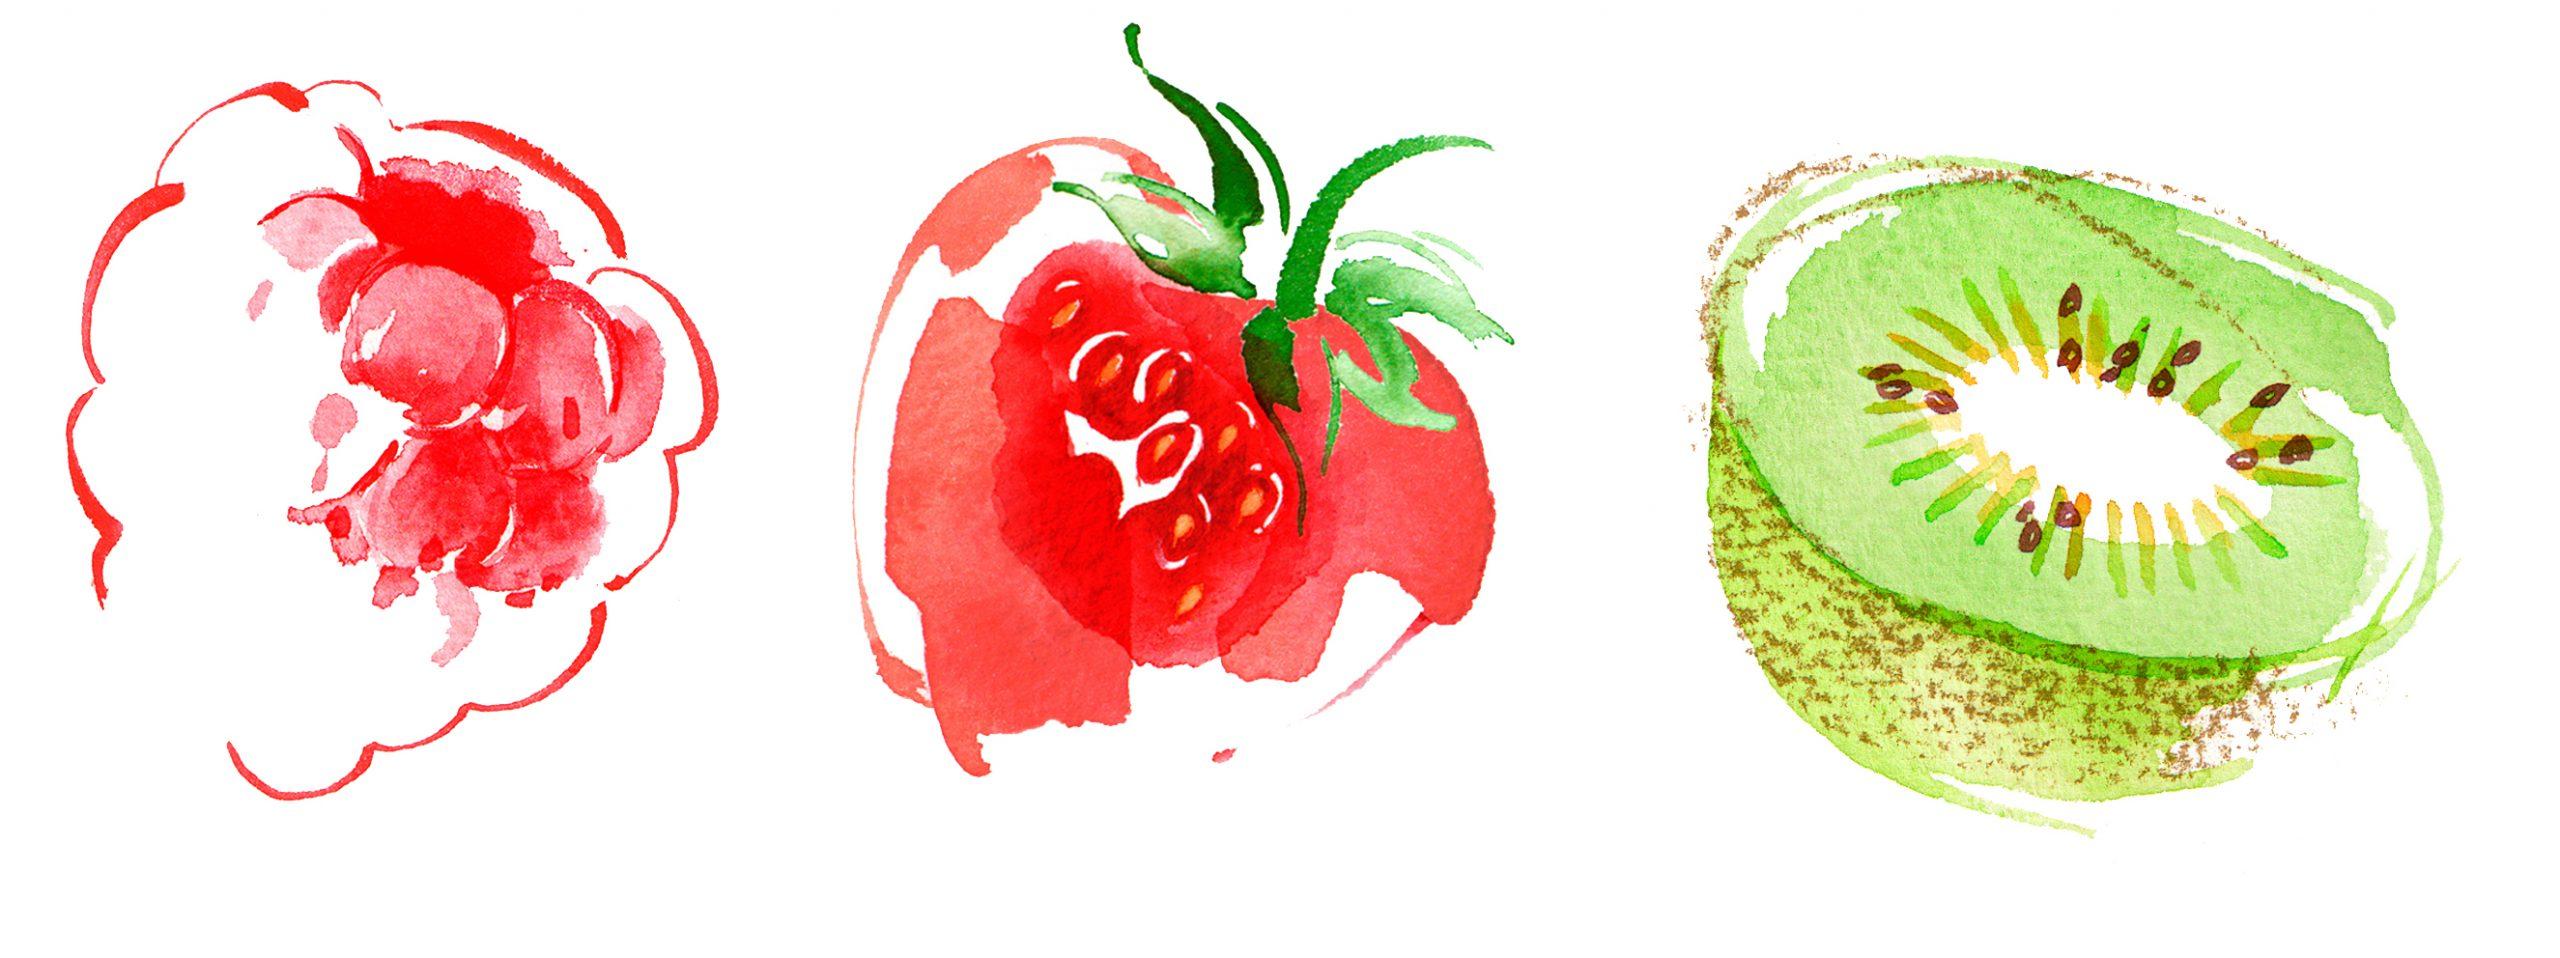 Illustration Food Drink Fruit Bar Harrods Strawberries Kiwi Raspberry Raspberries